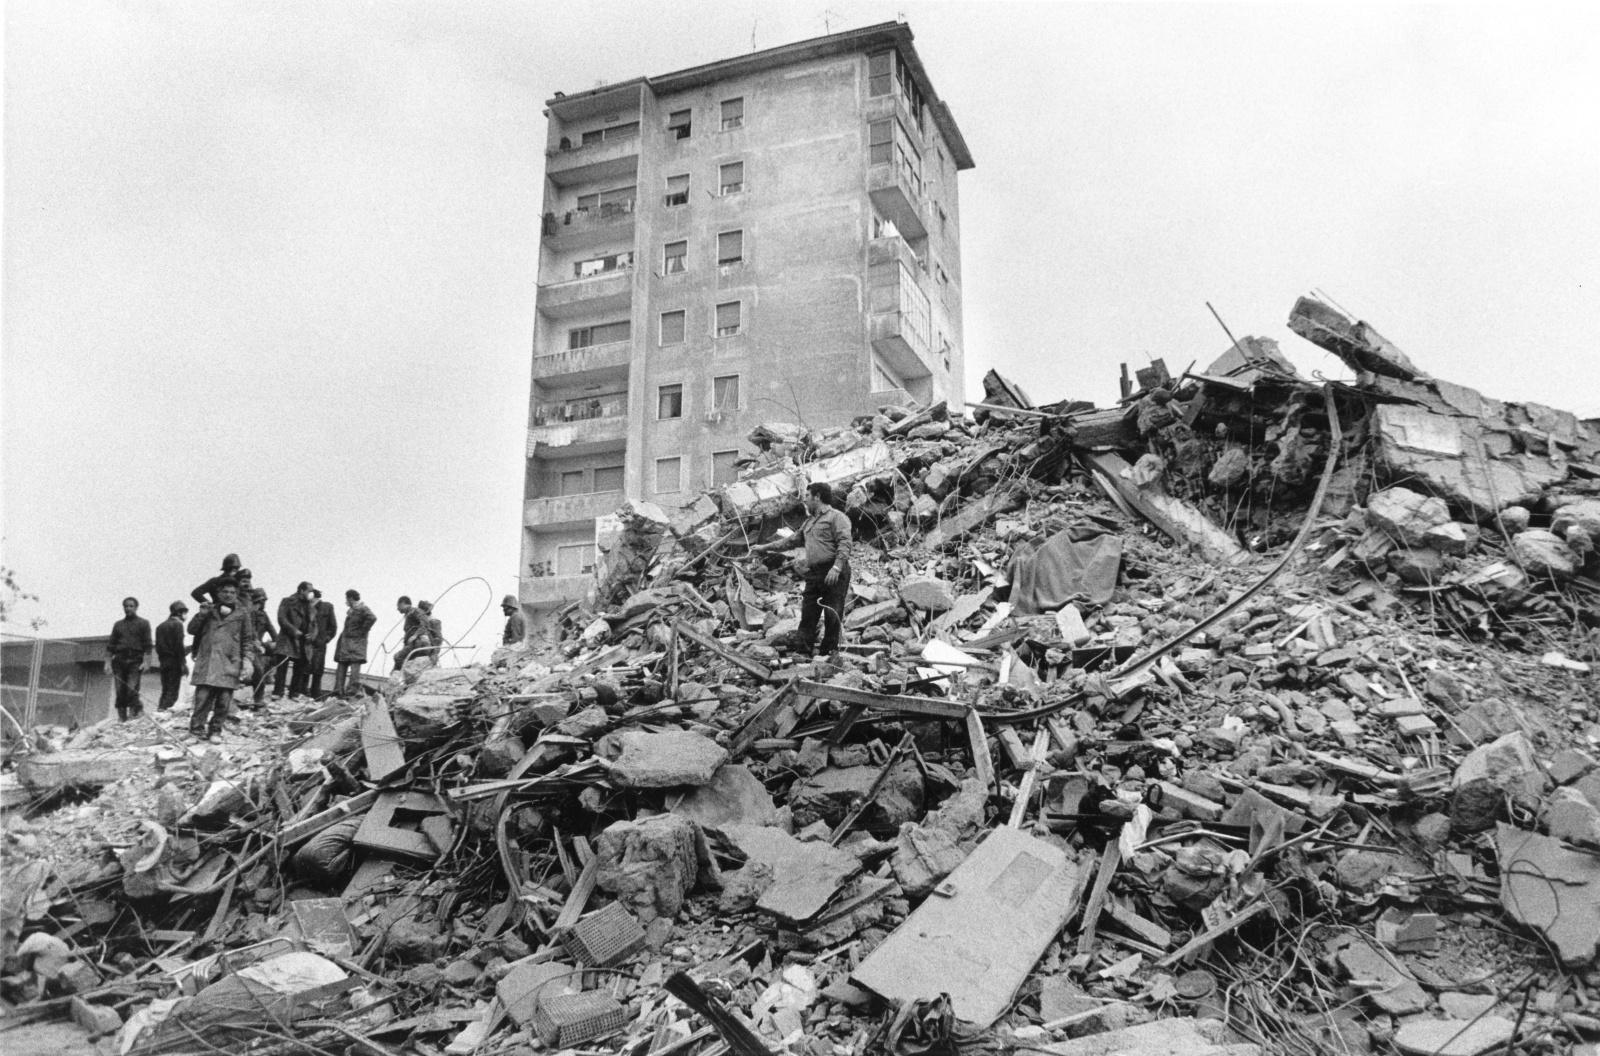 Terremoto in Irpinia - 23 novembre 1980